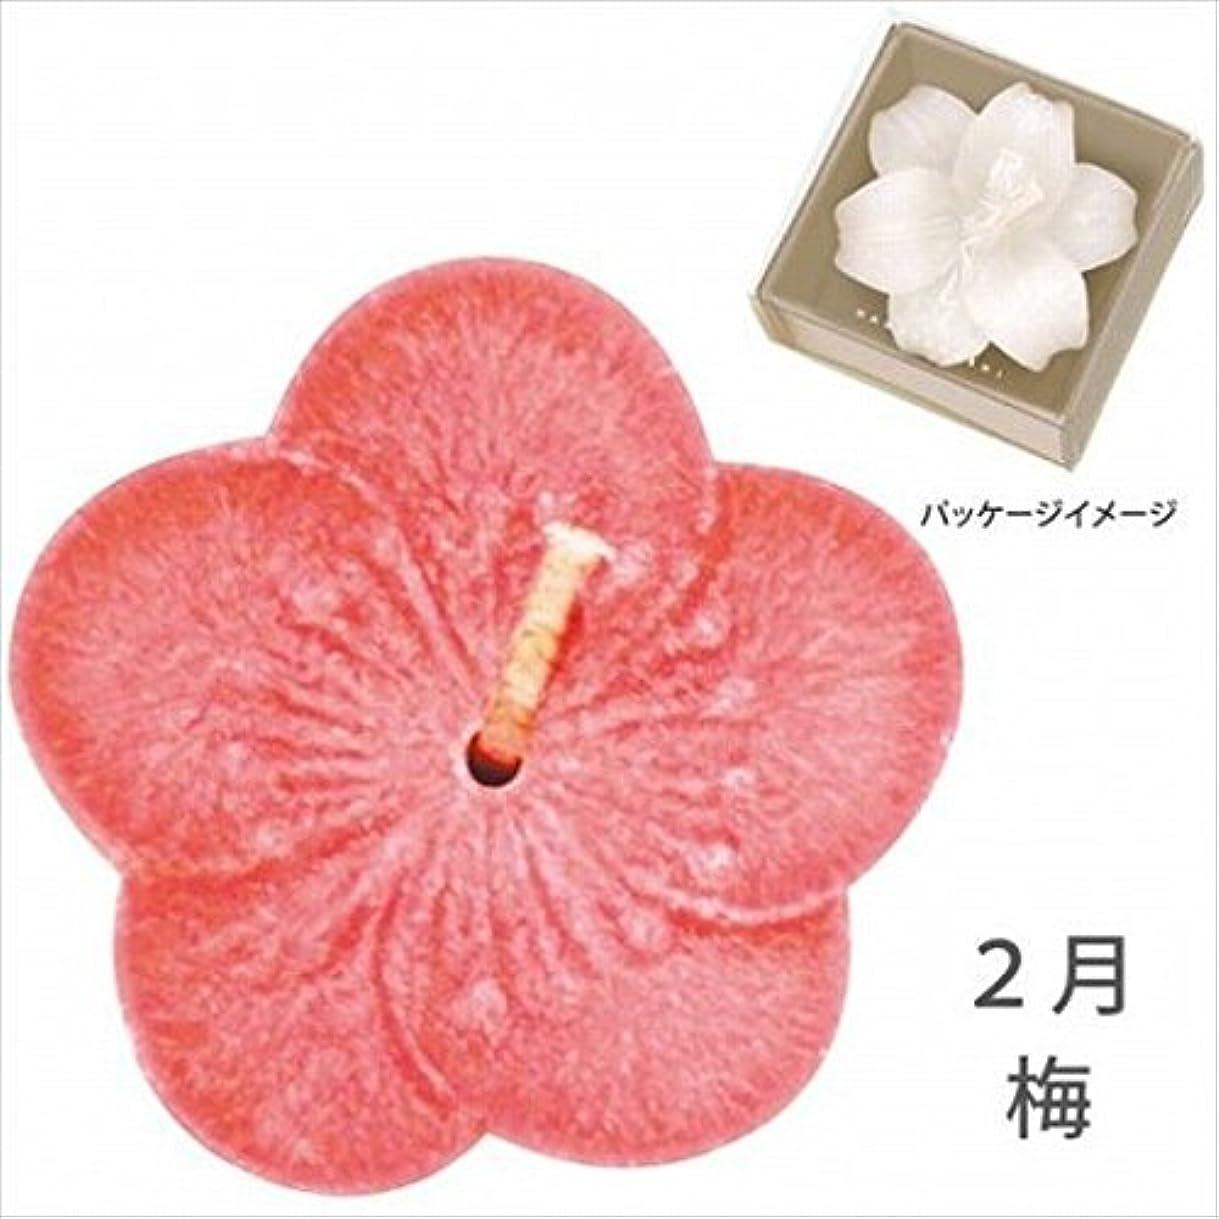 kameyama candle(カメヤマキャンドル) 花づくし(植物性) 梅 「 梅(2月) 」 キャンドル(A4620550)